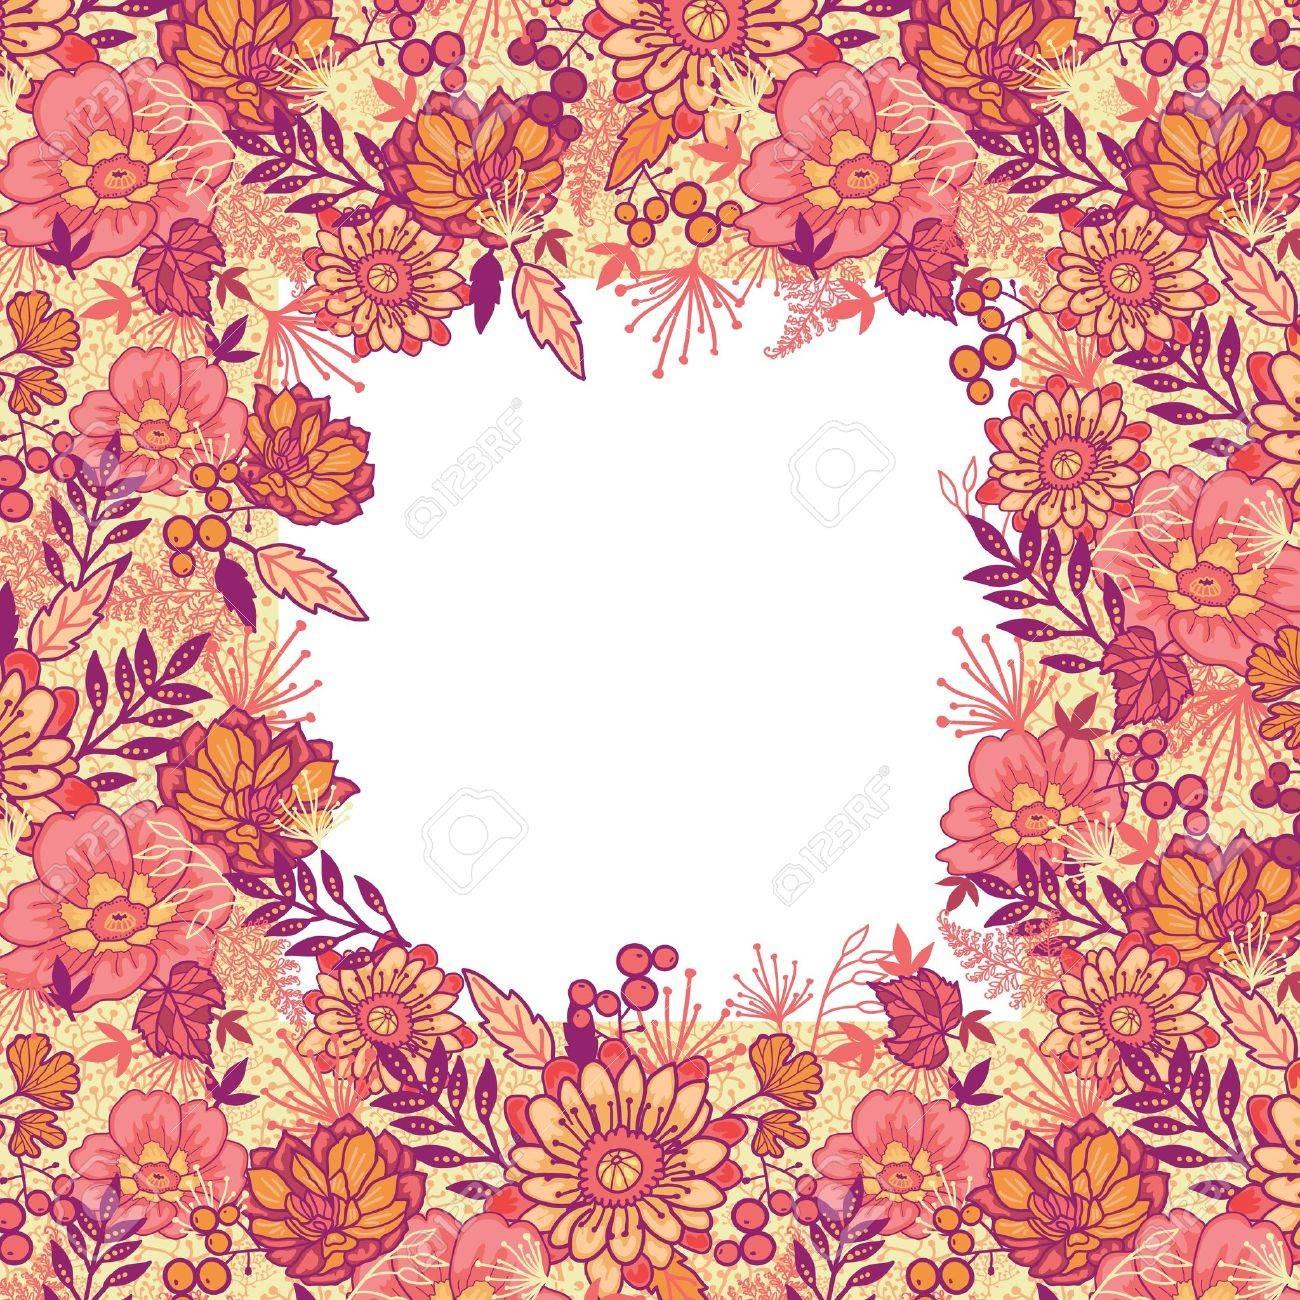 Fall flowers frame seamless pattern background border Stock Vector - 16446382